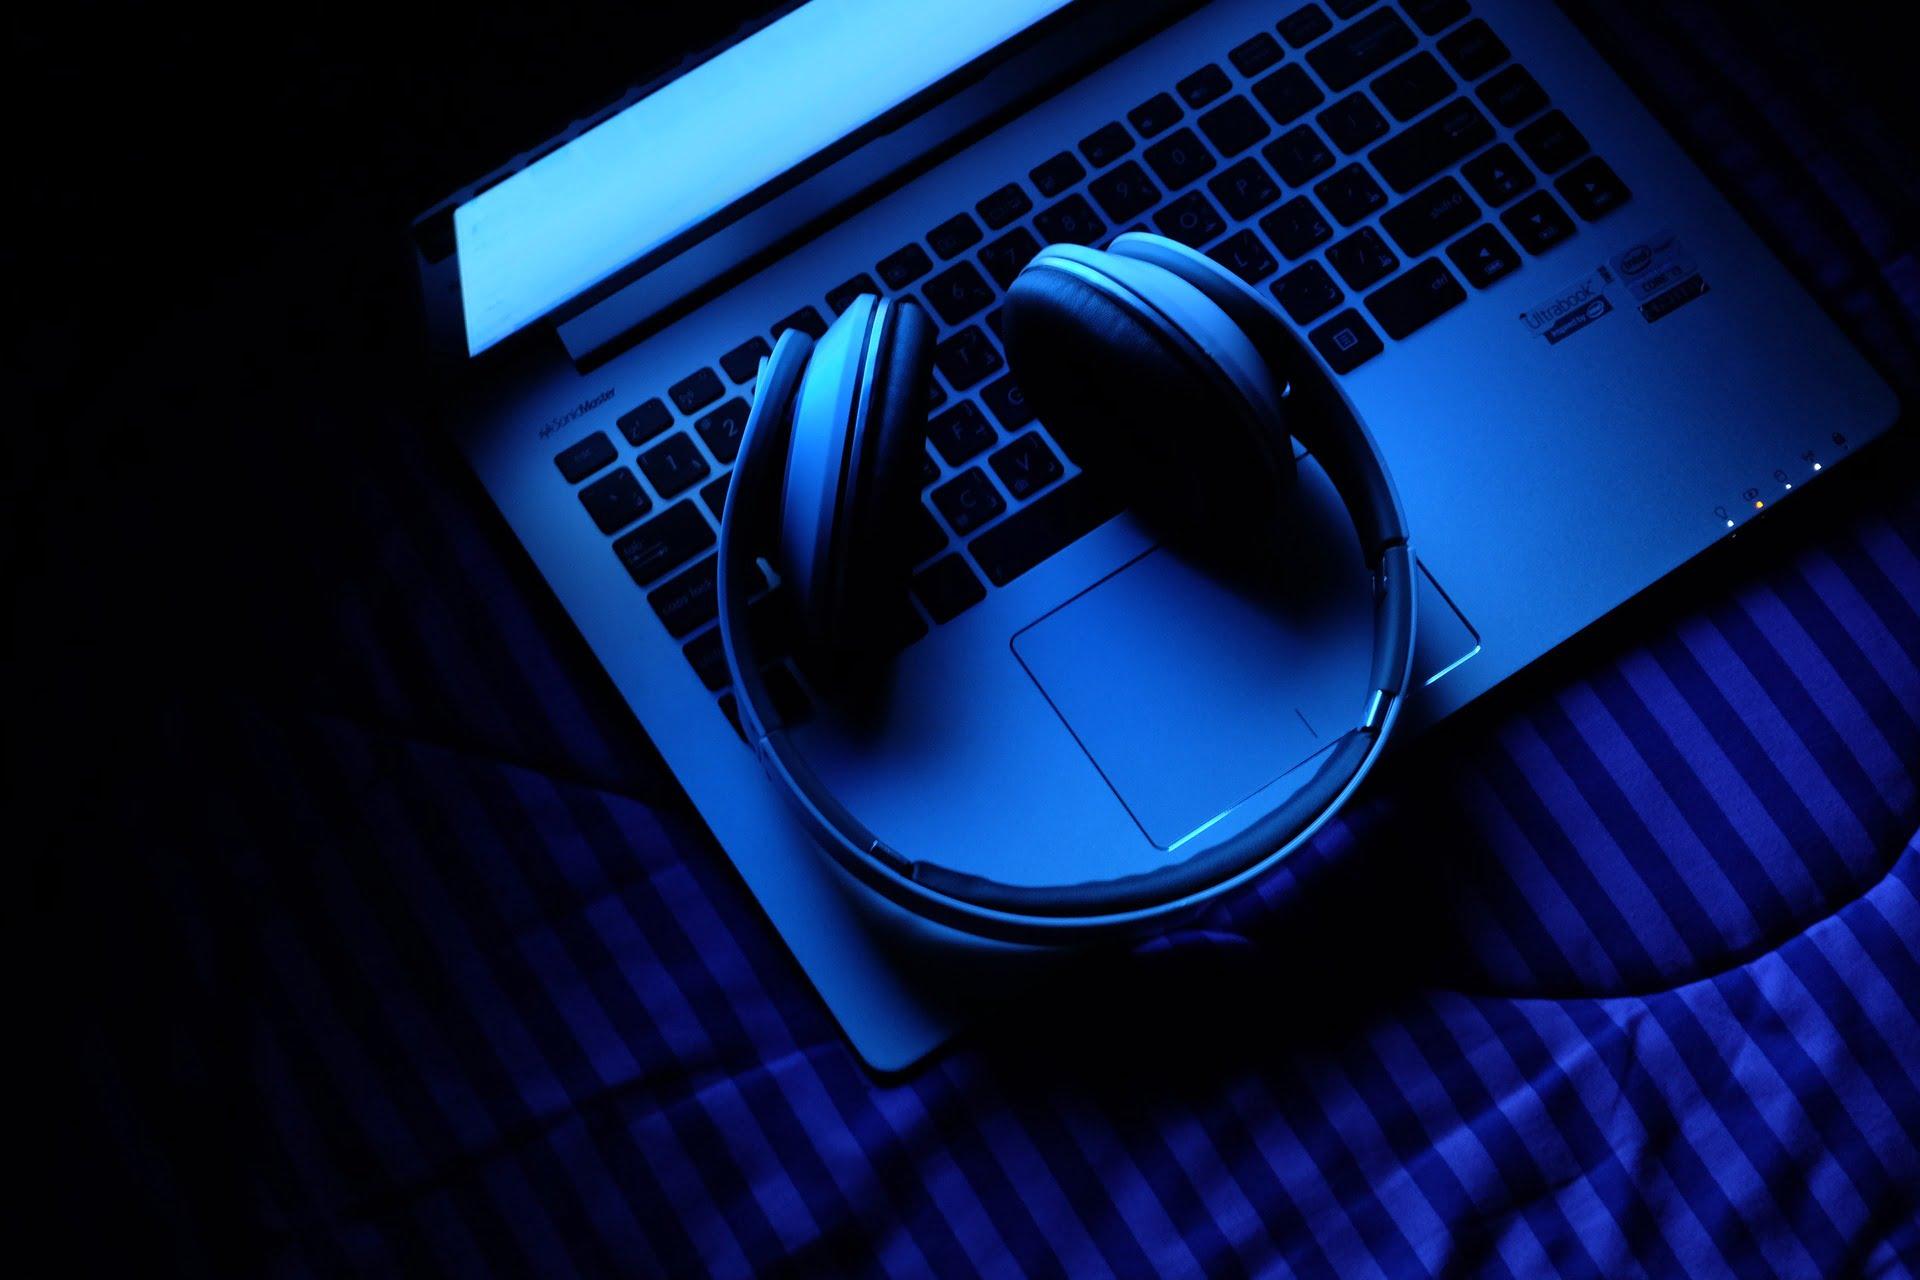 Darmowy program do transkrypcji nagrań